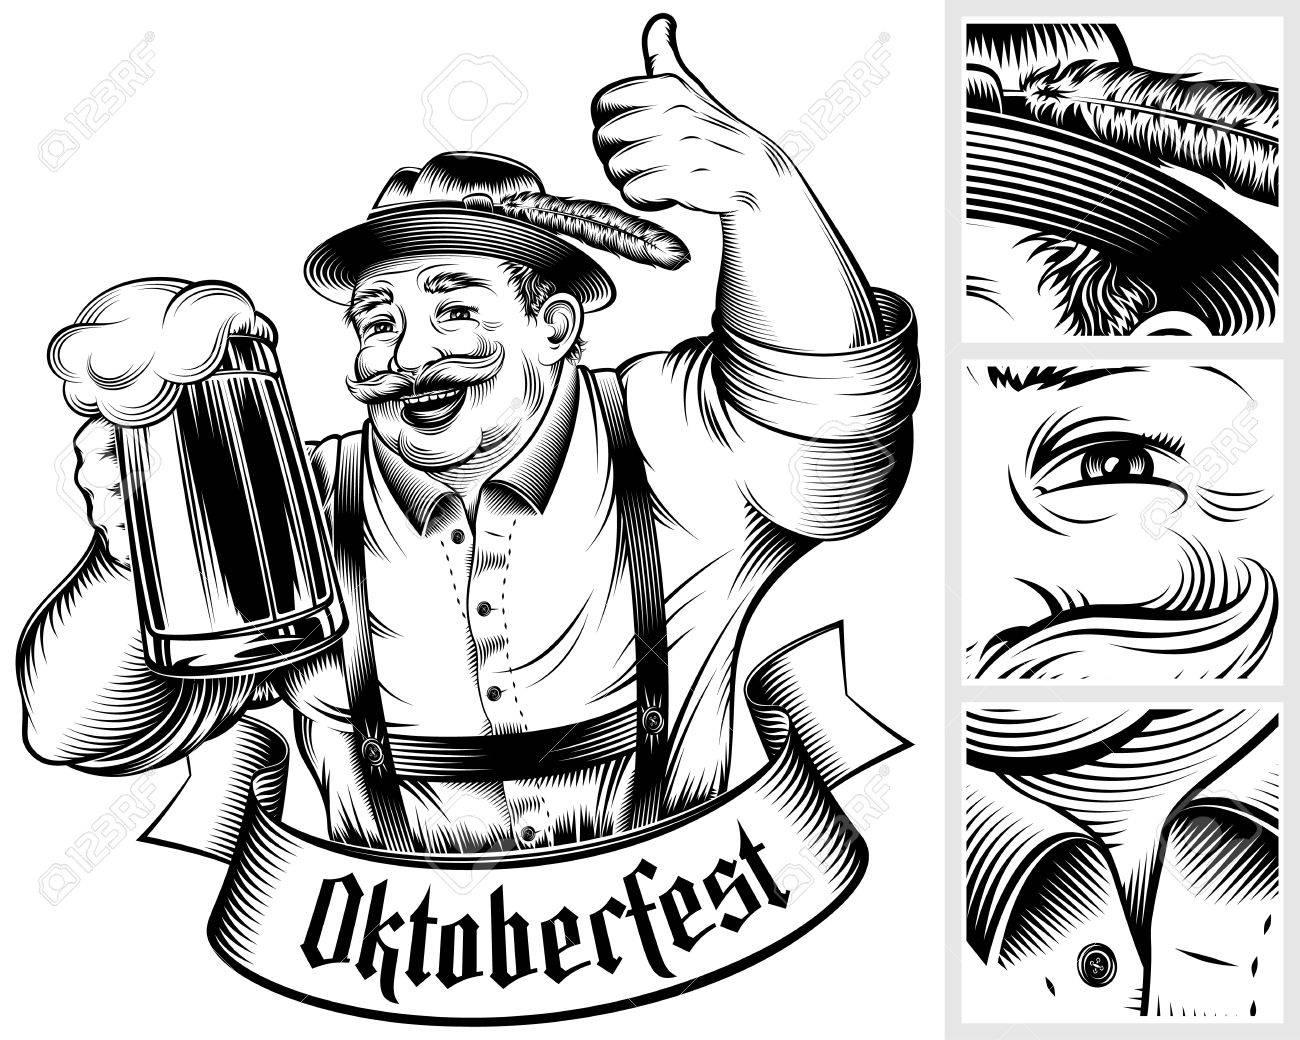 1300x1040 Beer Festival Oktoberfest. Man Holding Beer Glass With Foamy